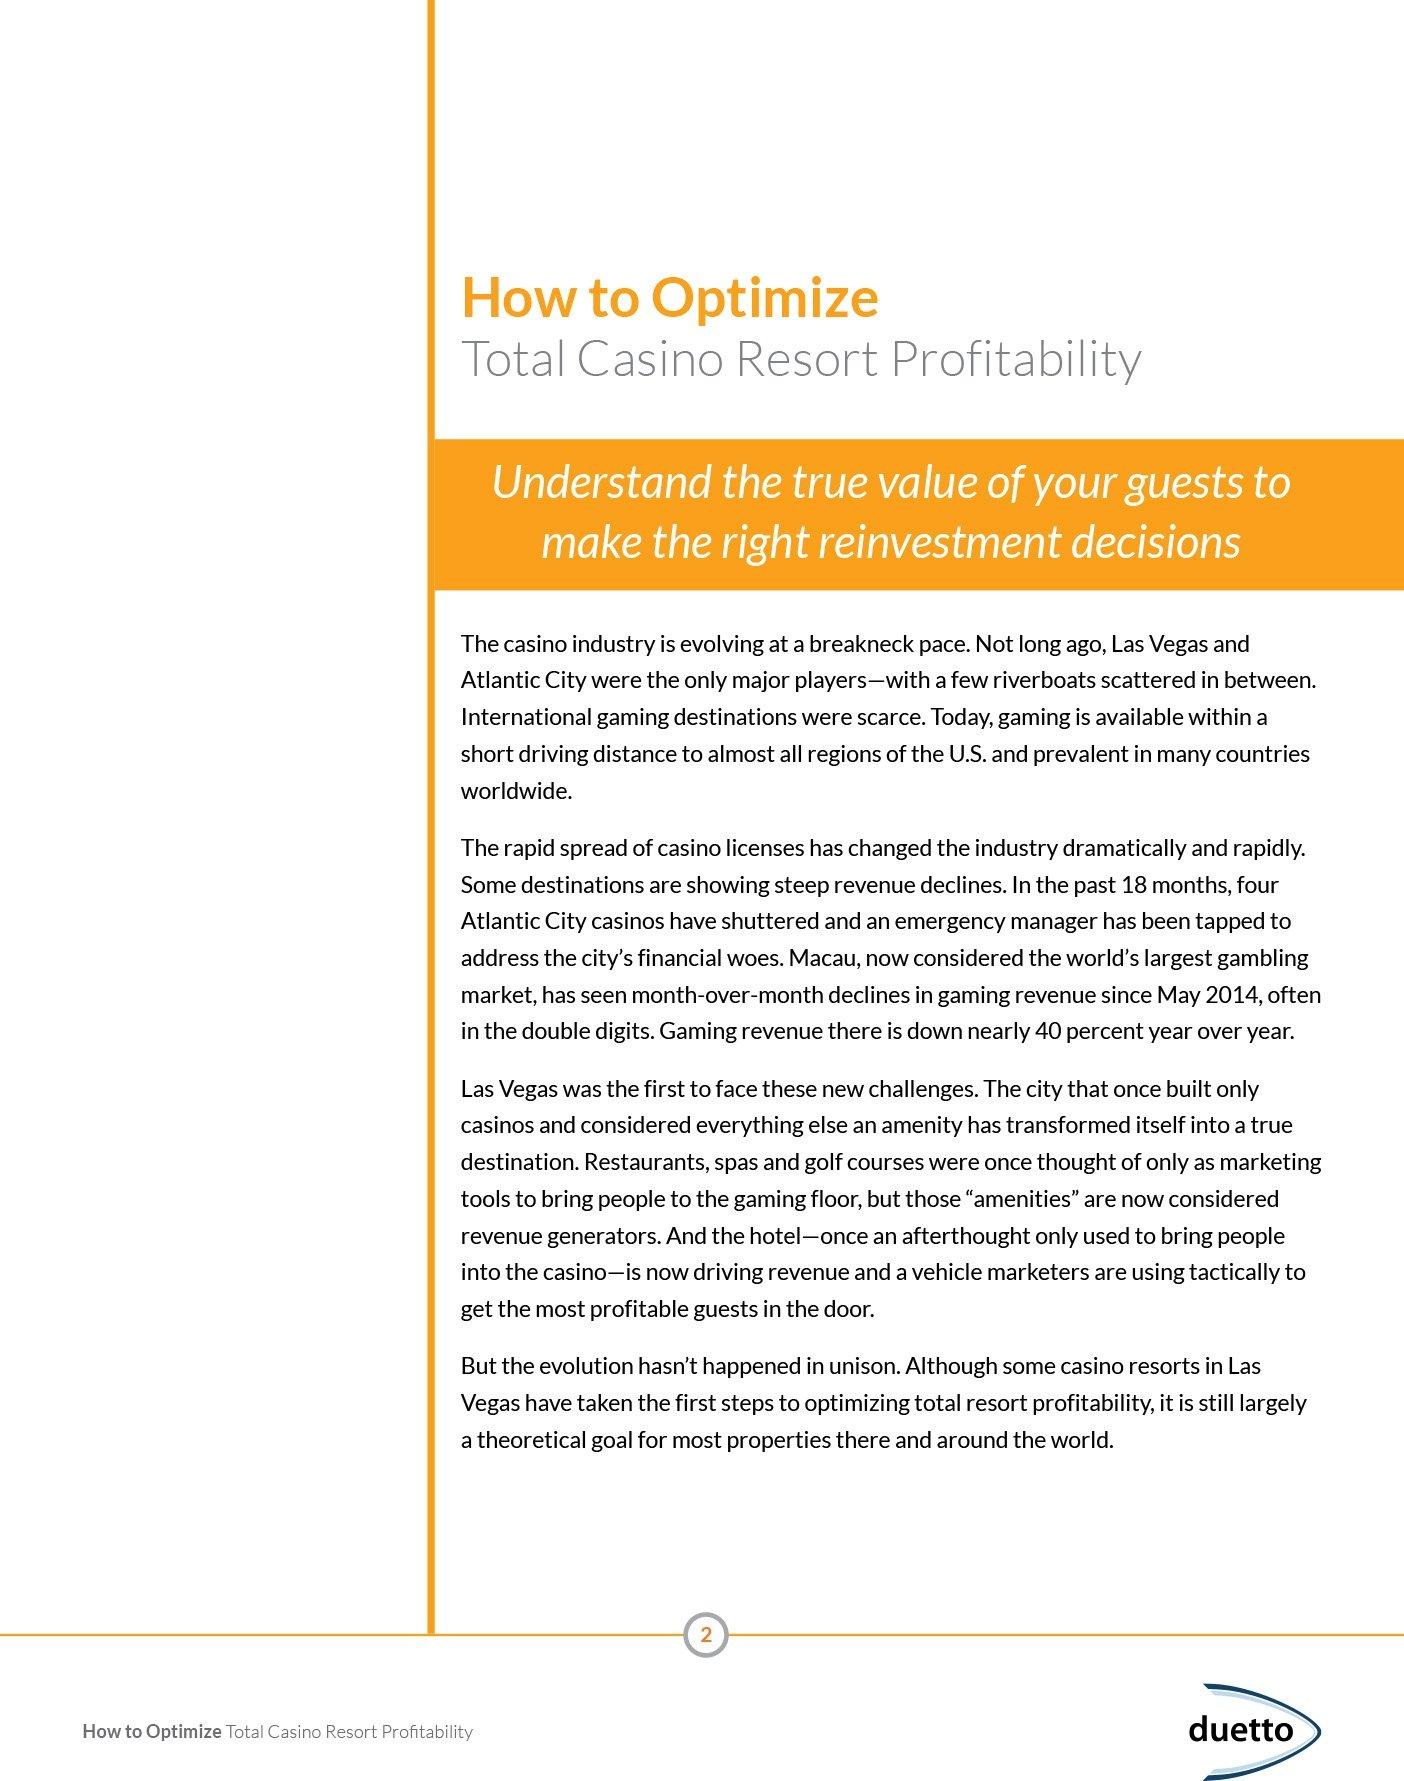 2How-to-Optimize-Casino-Profitability-2.jpg